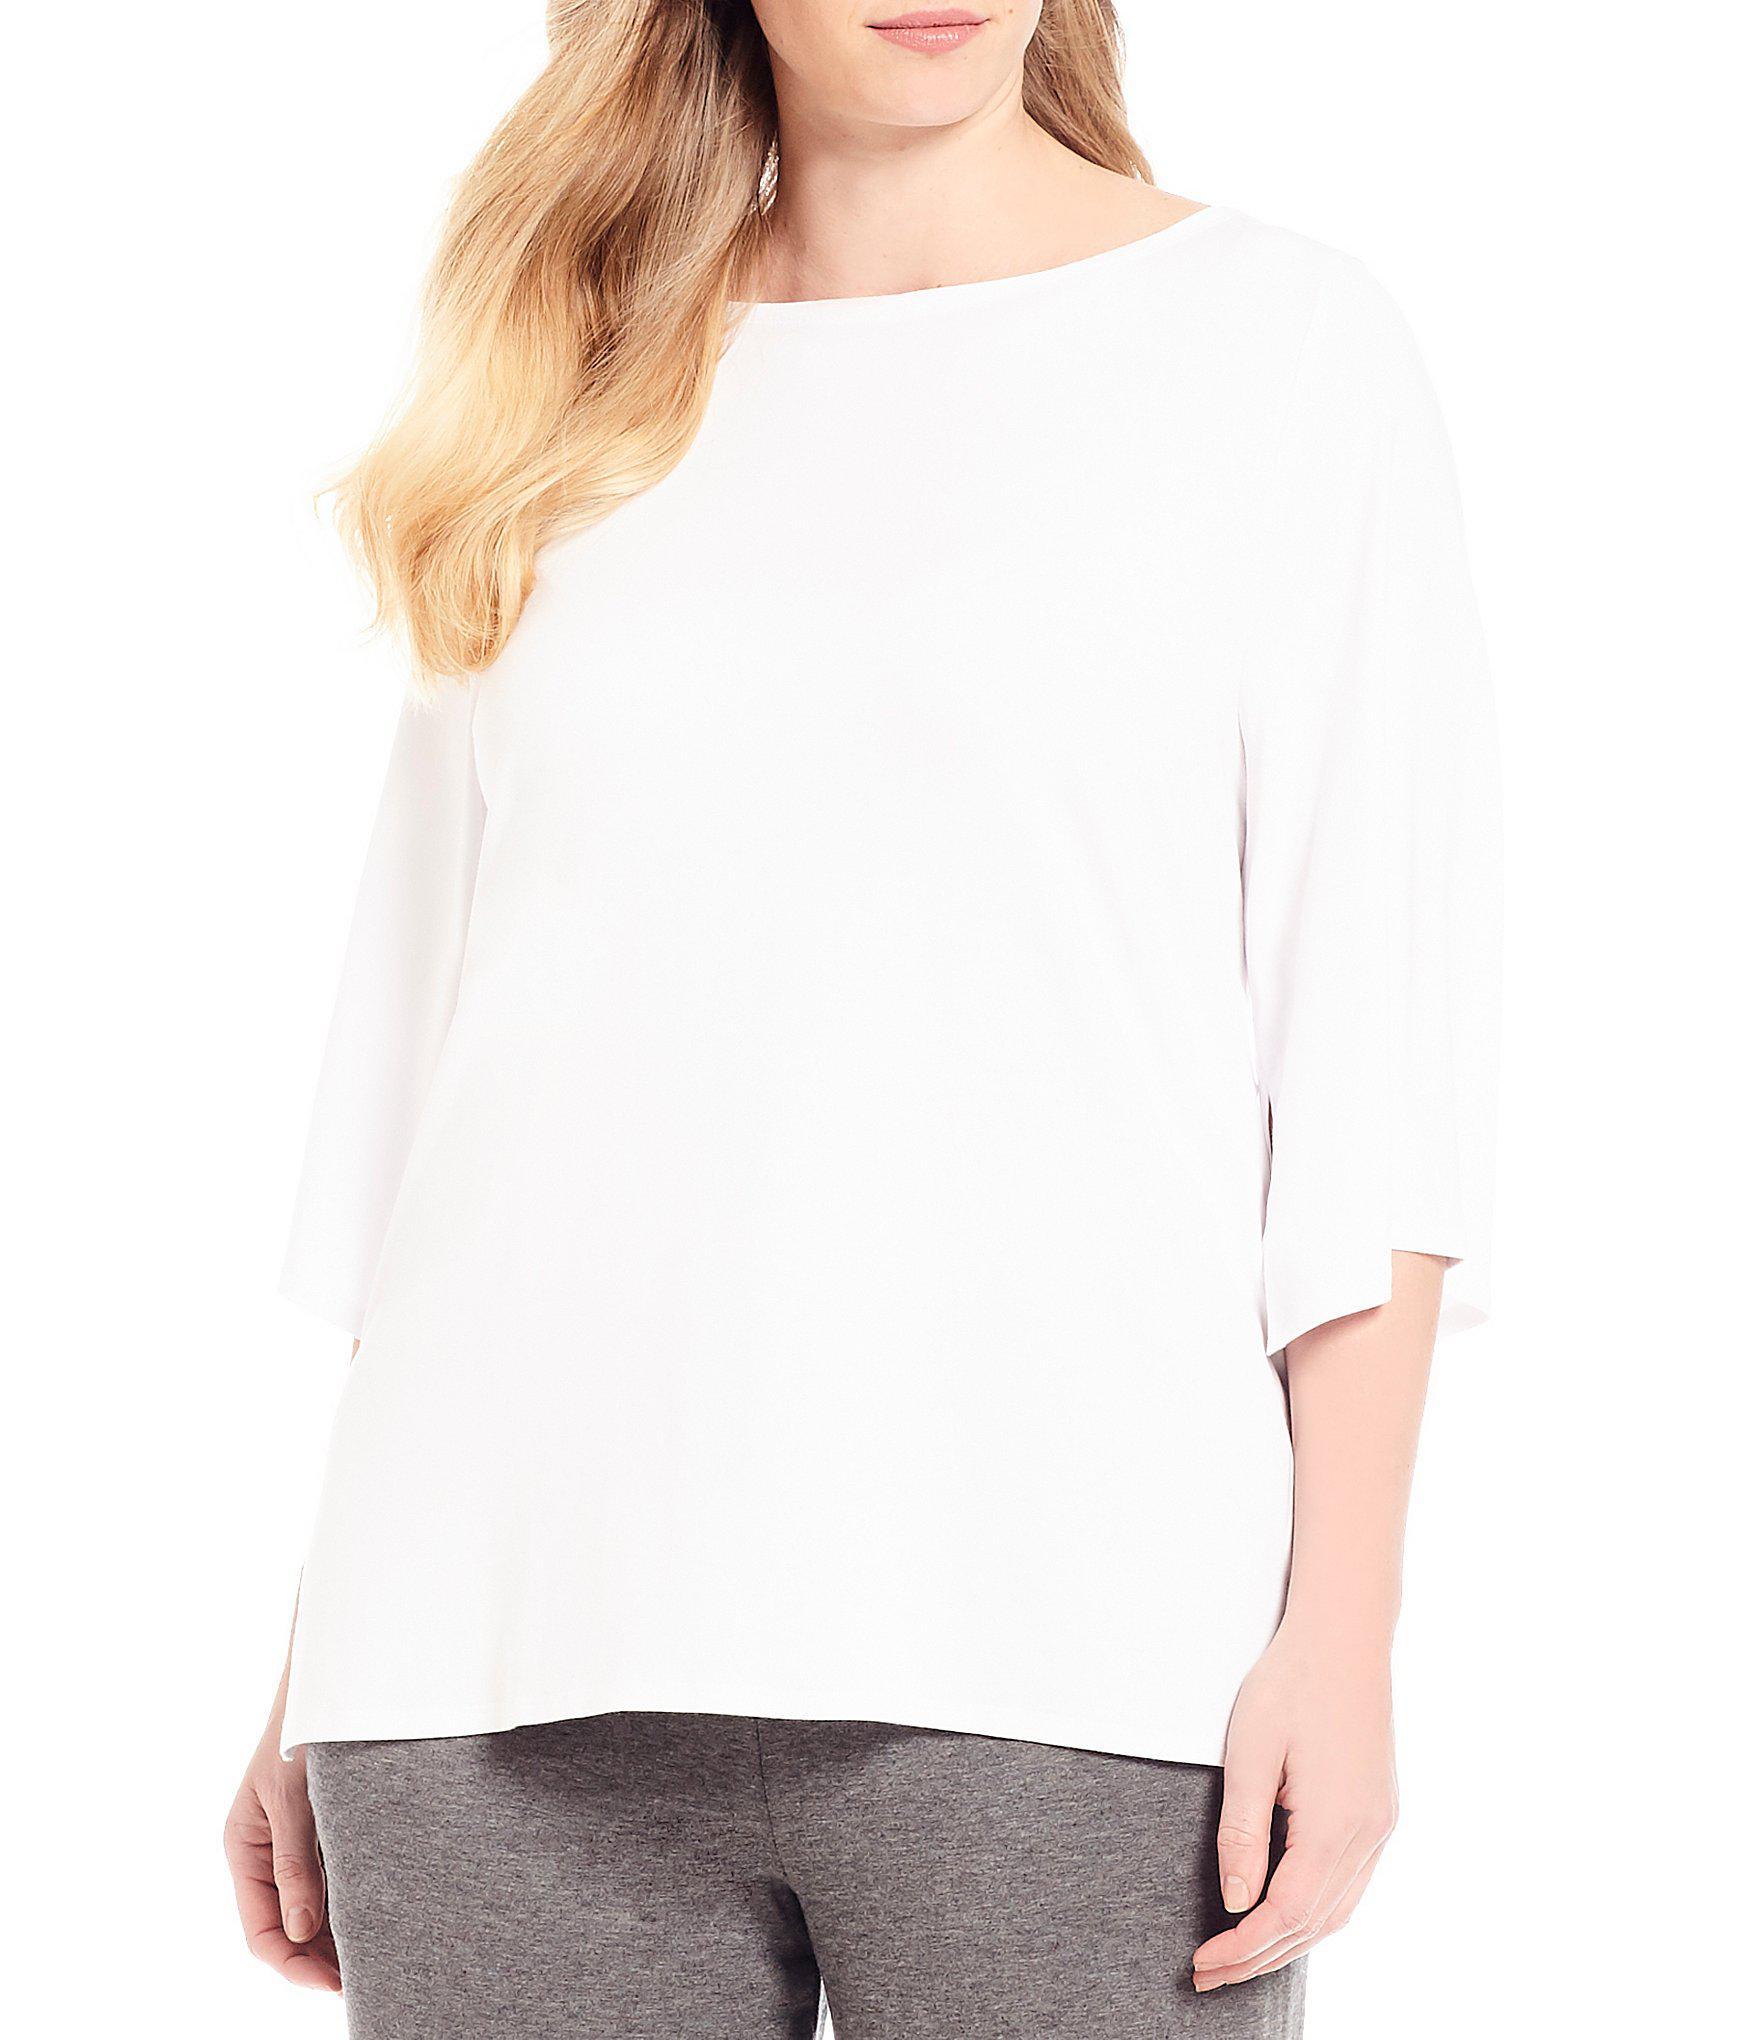 b46750ead3d Lyst - Eileen Fisher Plus Size Bateau Neck Top in White